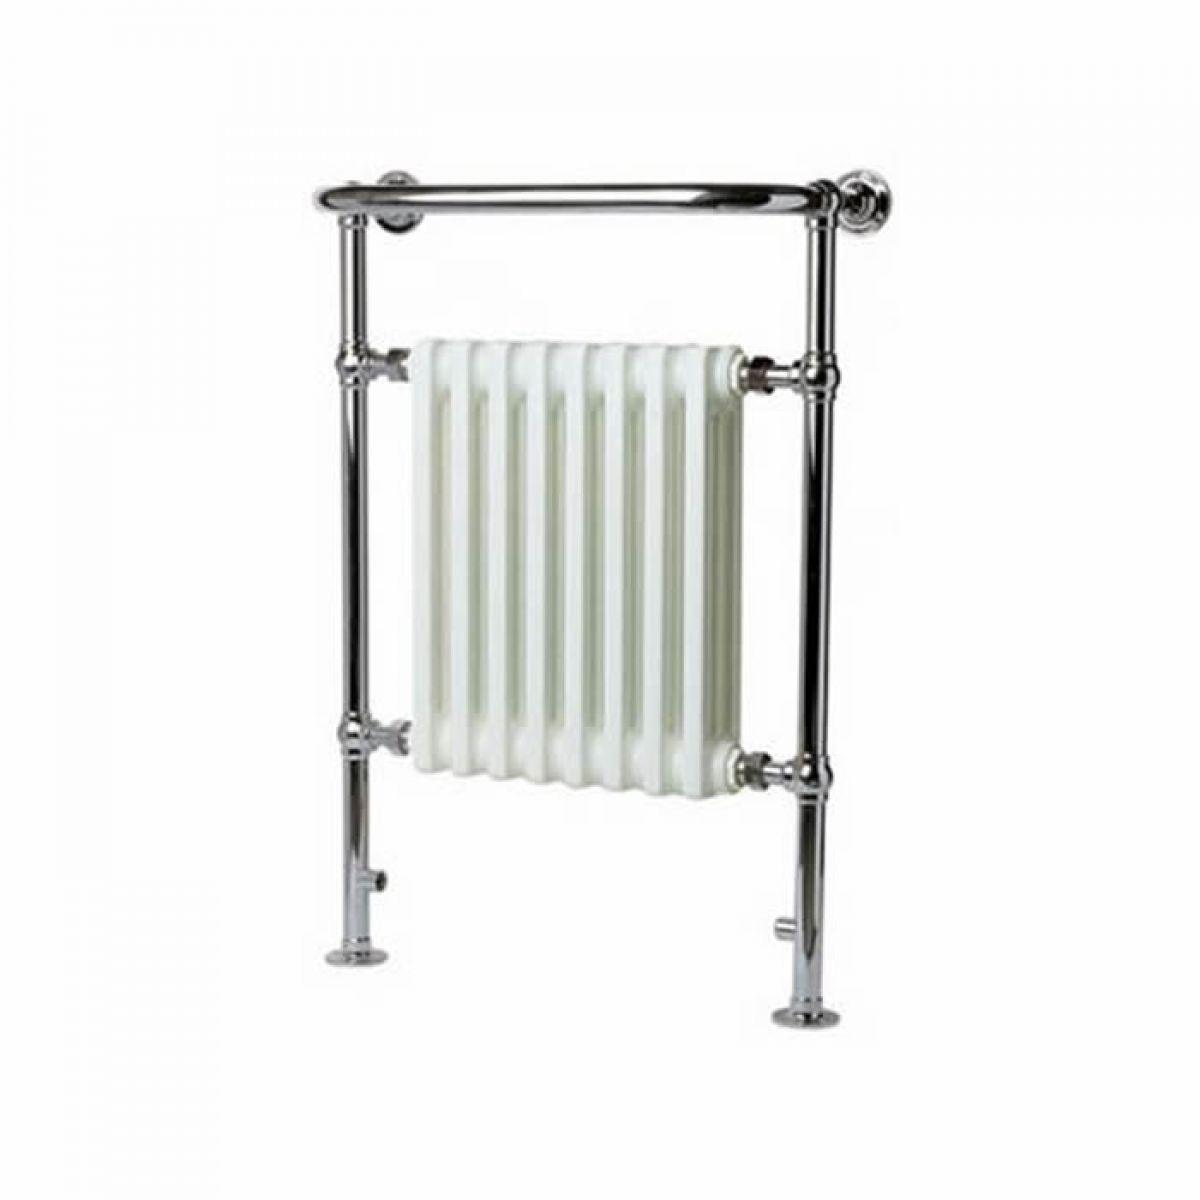 apollo ravenna traditional towel rail cr dual fuel uk. Black Bedroom Furniture Sets. Home Design Ideas